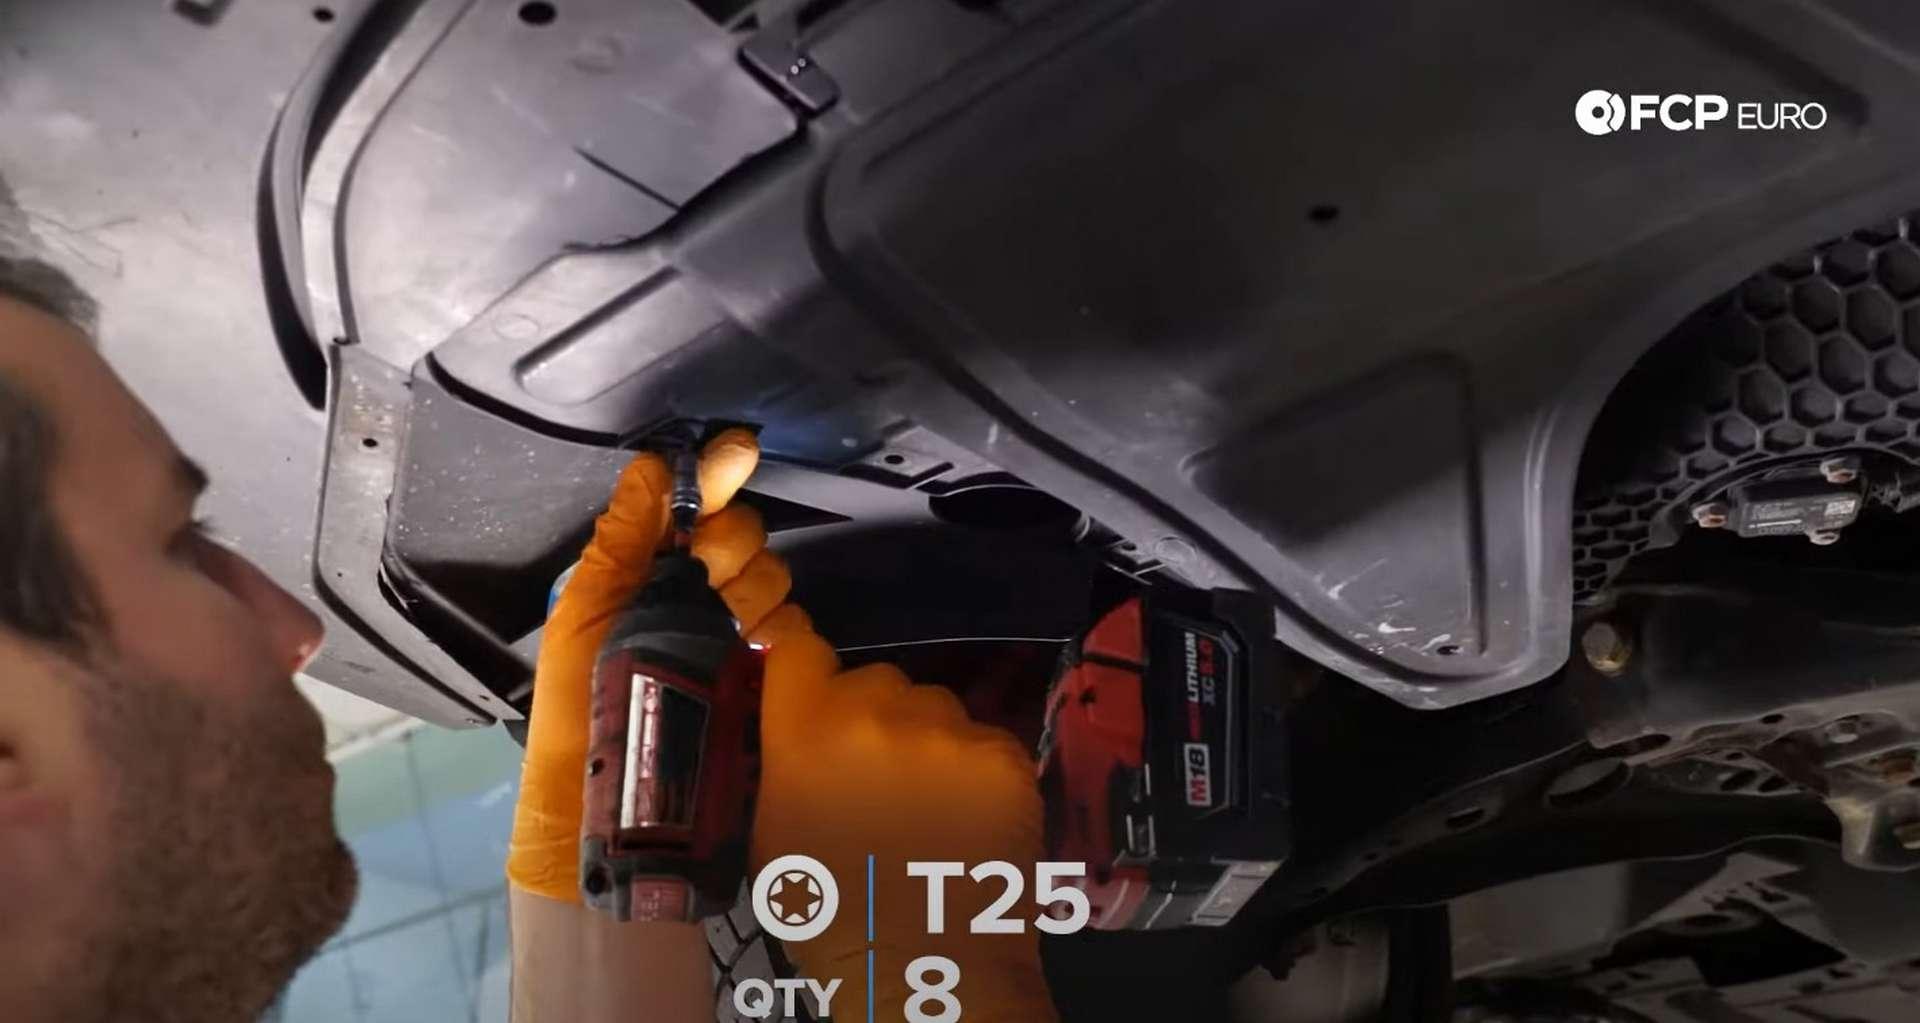 DIY MK7 VW GTI Turbocharger Upgrade removing the splash shield